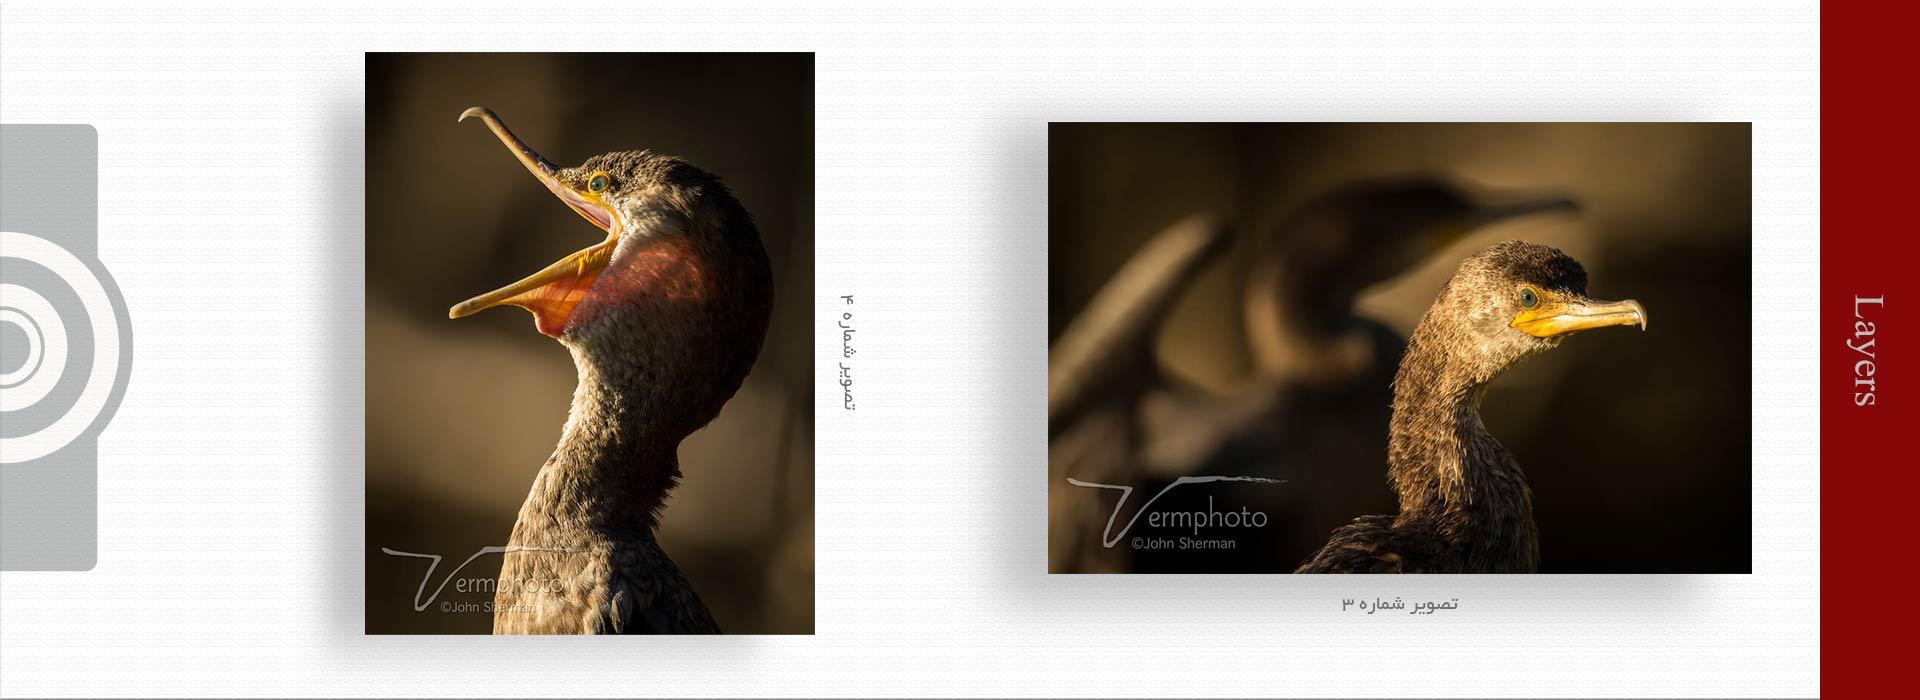 layers in photography 2 - مهمترین ویژگی های عکس خوب چیست ؟